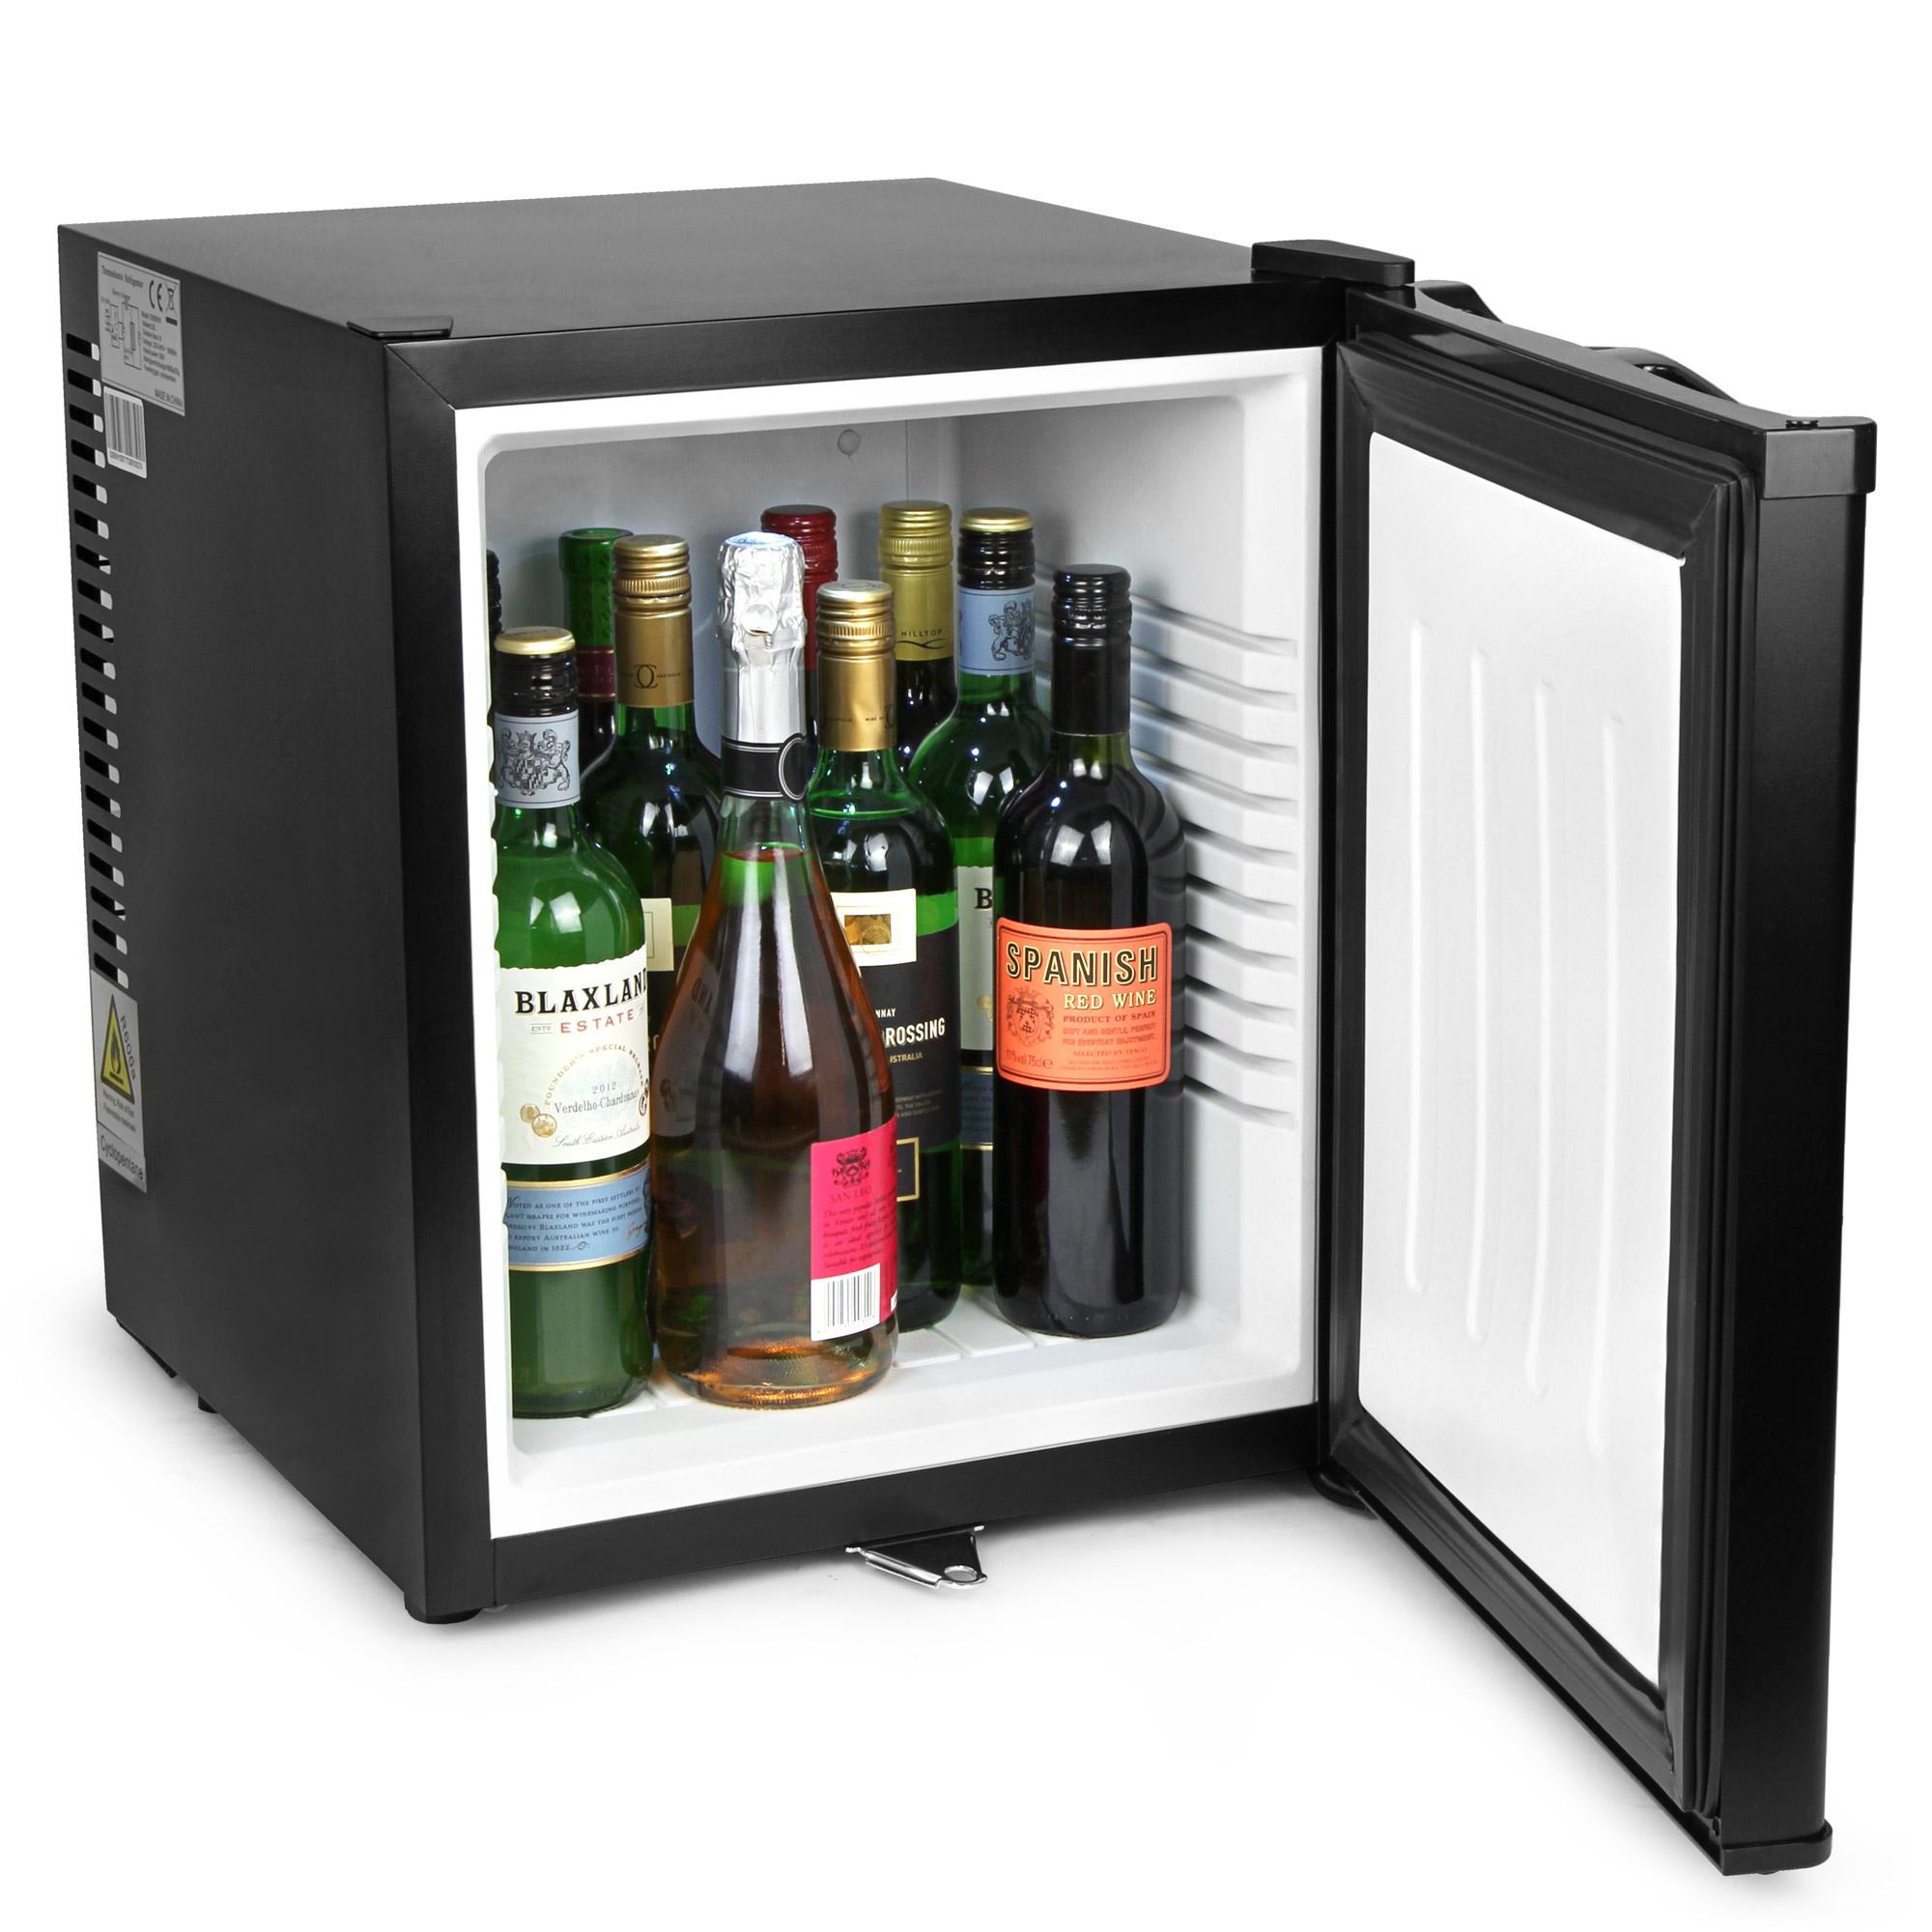 chillquiet silent mini bar fridge 32ltr black  silent